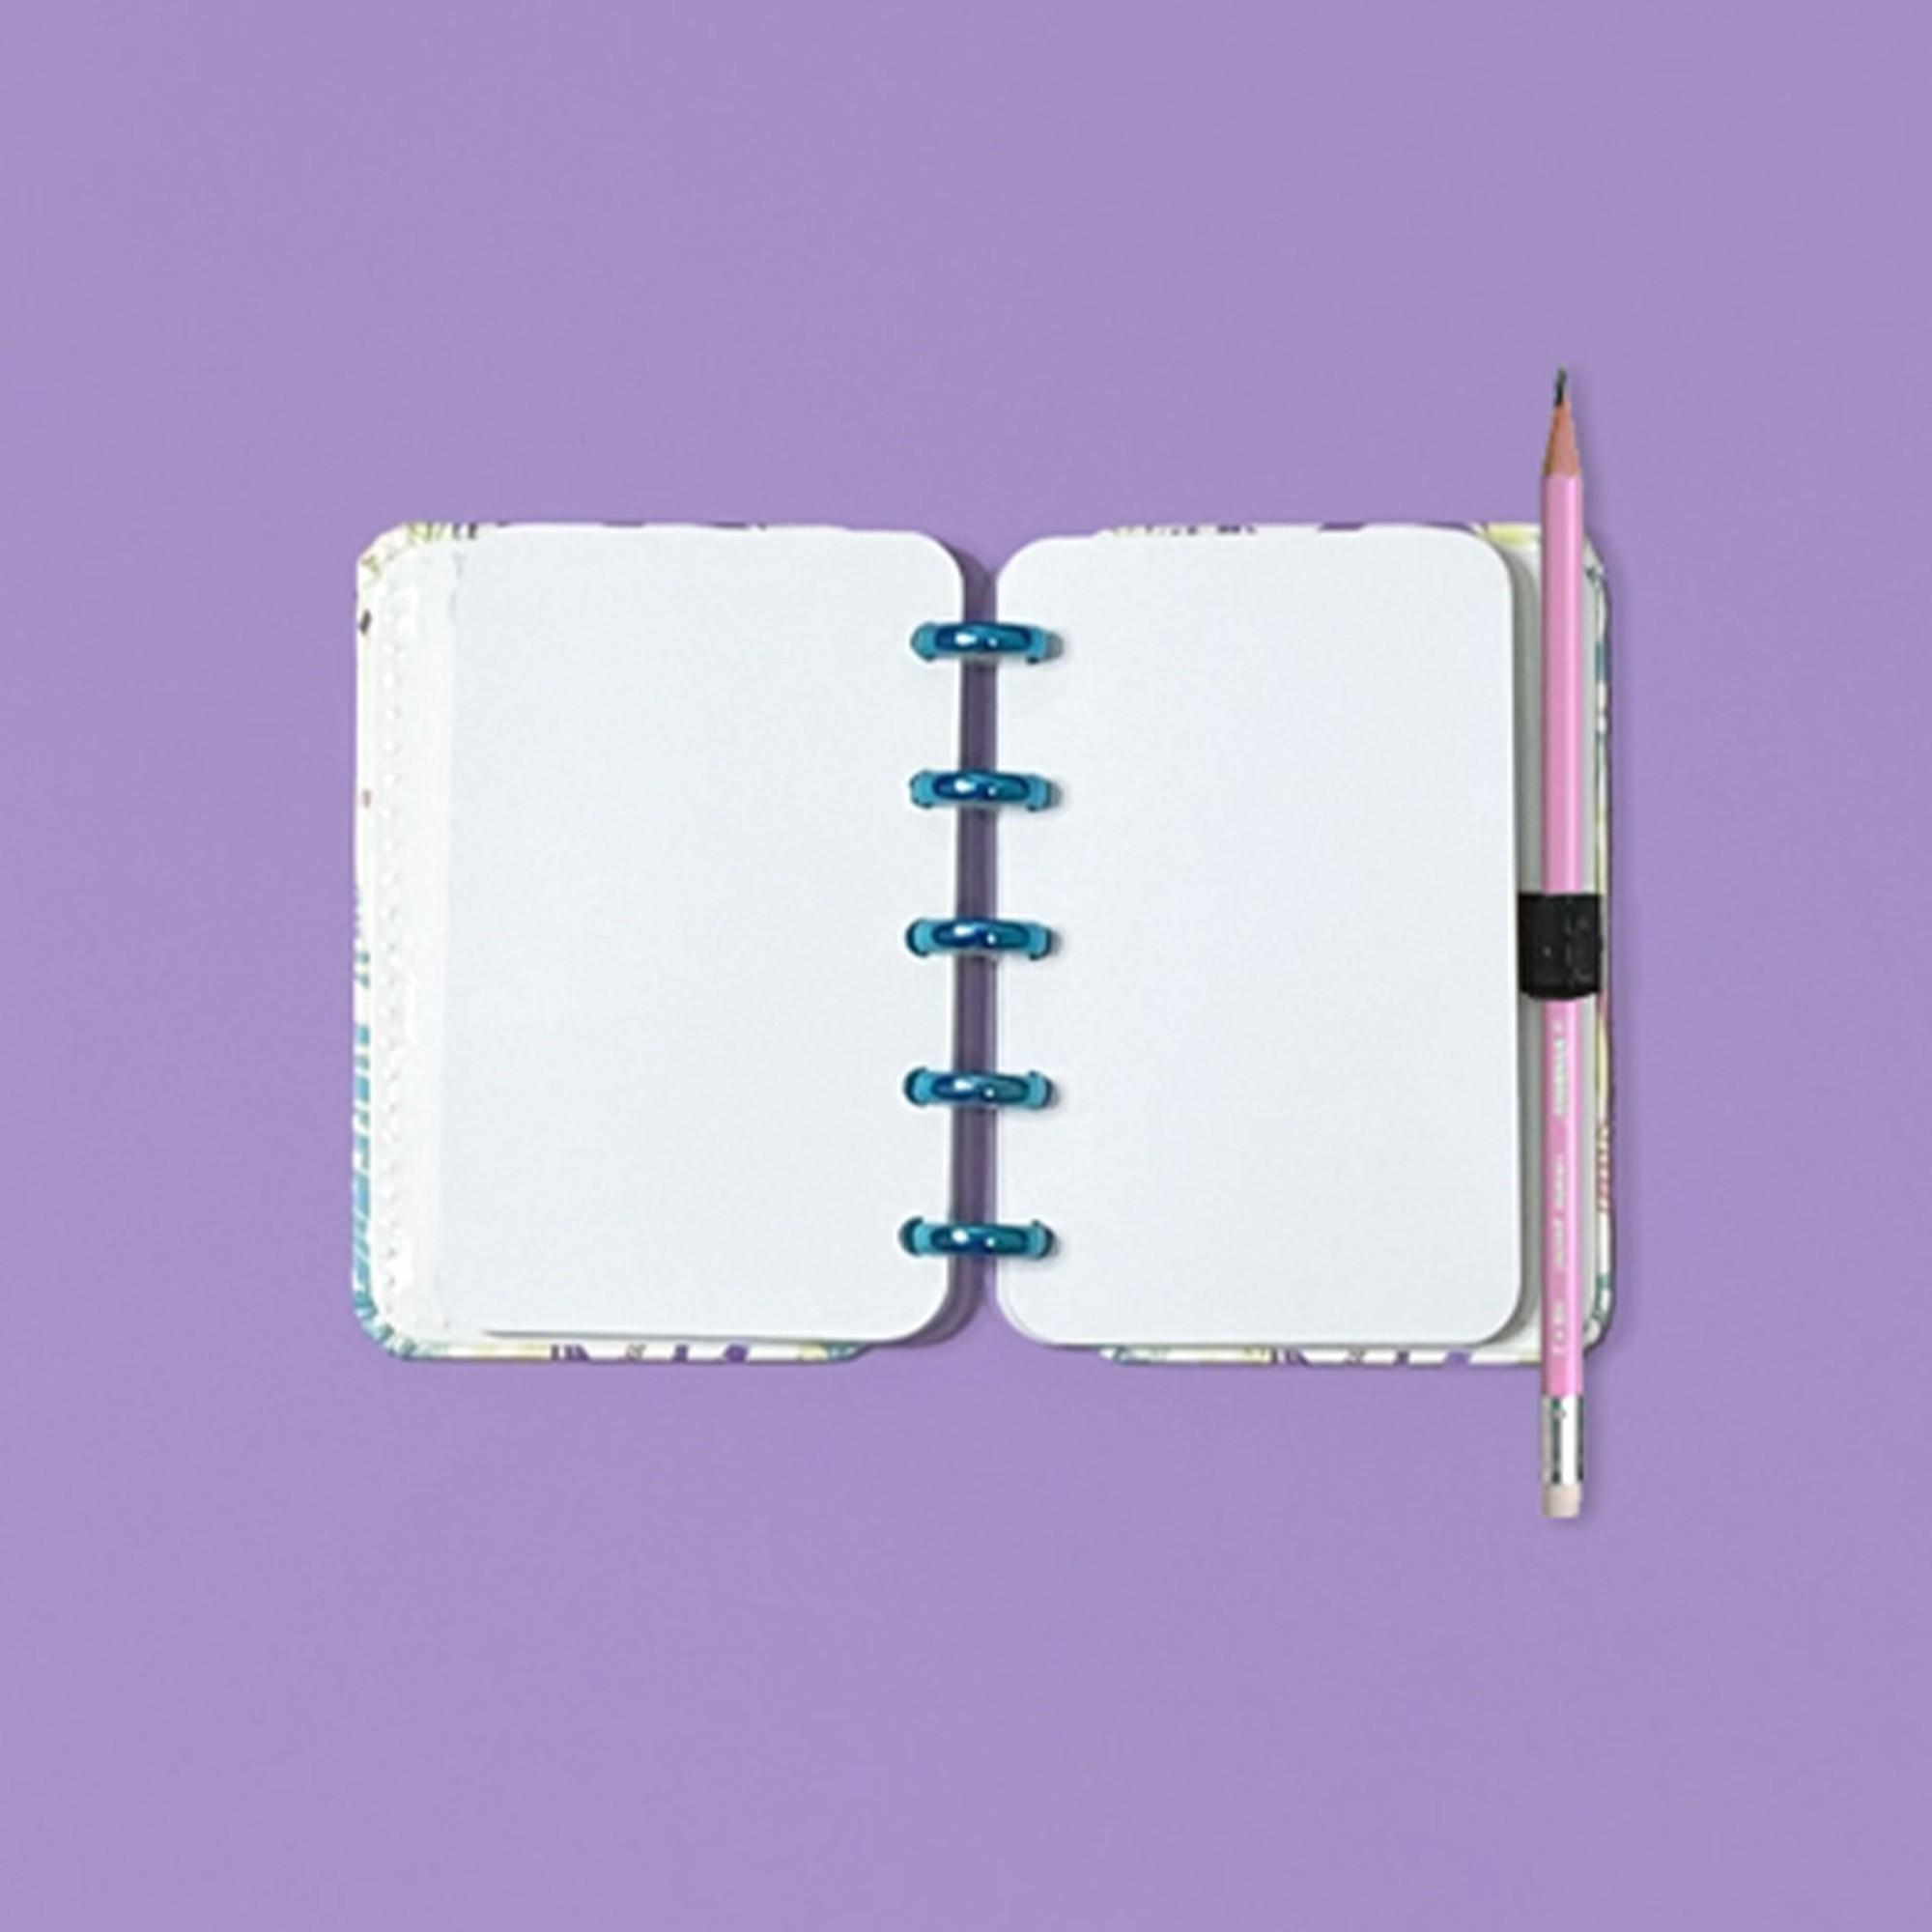 Caderno Inteligente Inteligine Estampa Mania Frutti